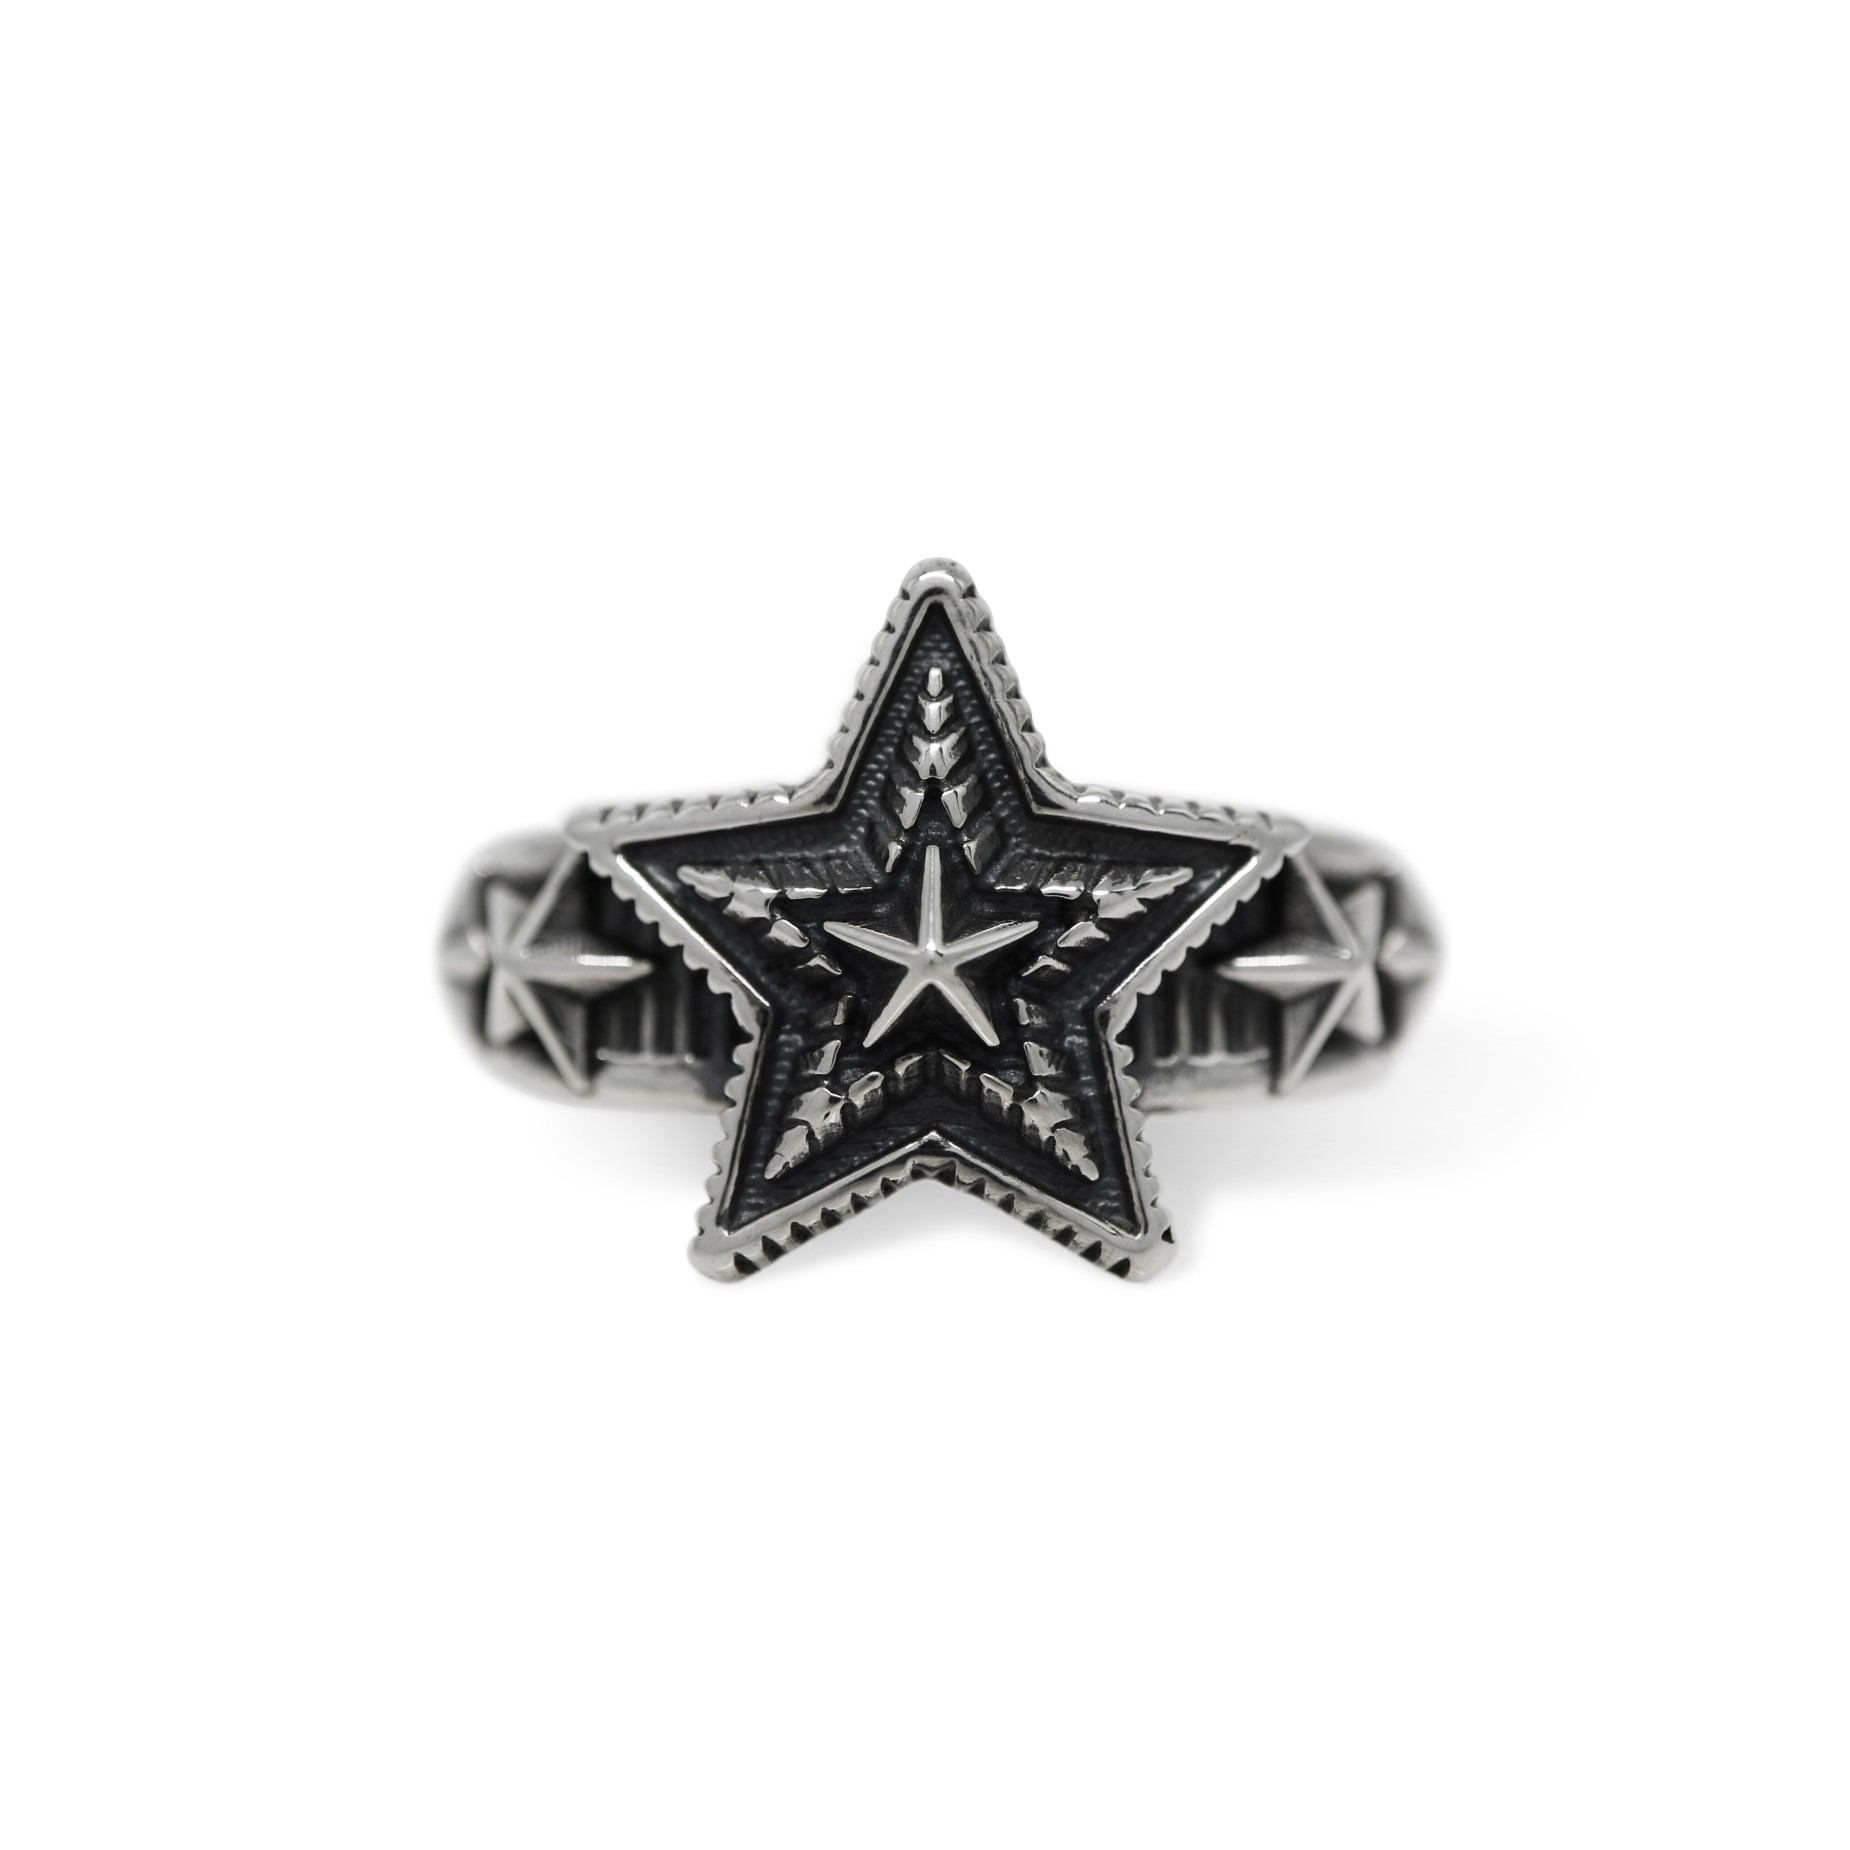 COMBO STAR RING [USD $730]